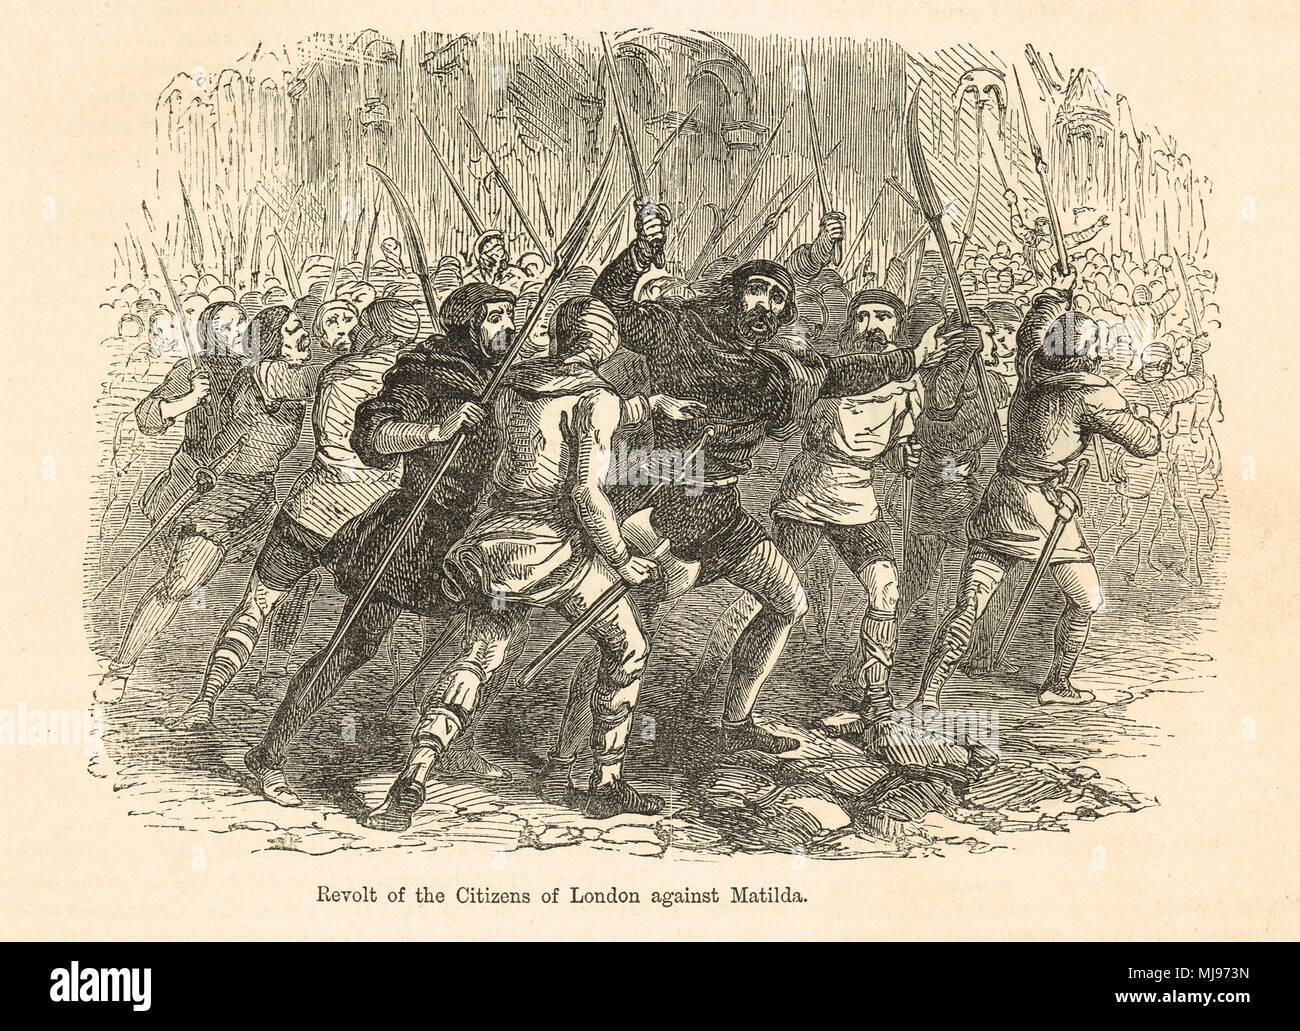 revolt of London citizens against Empress Matilda, June 1141 - Stock Image